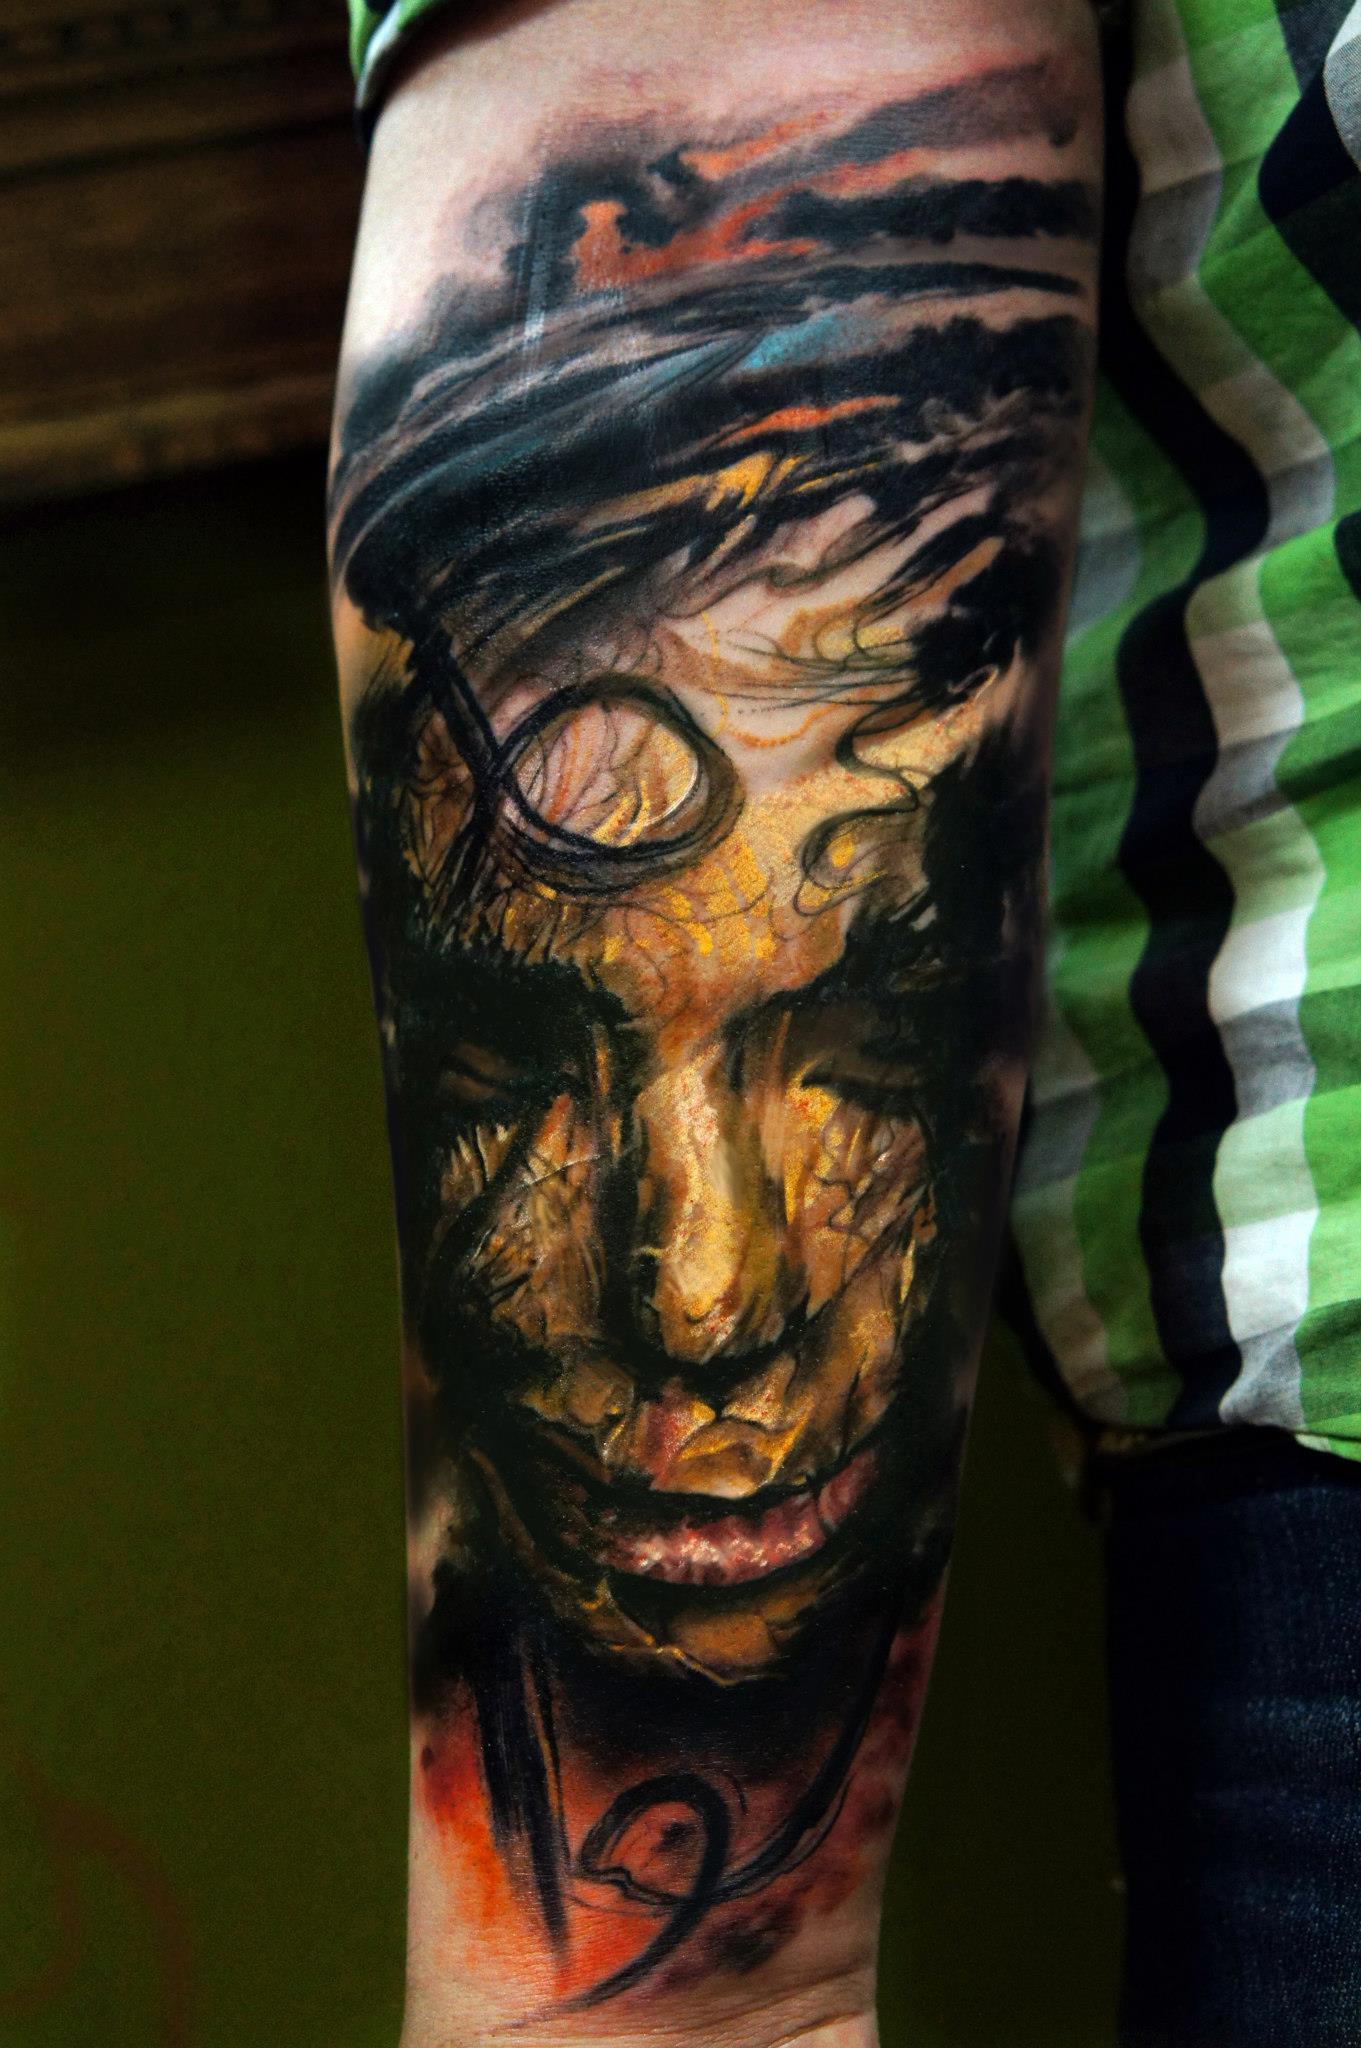 Domantas Parvainis, tattoo artist